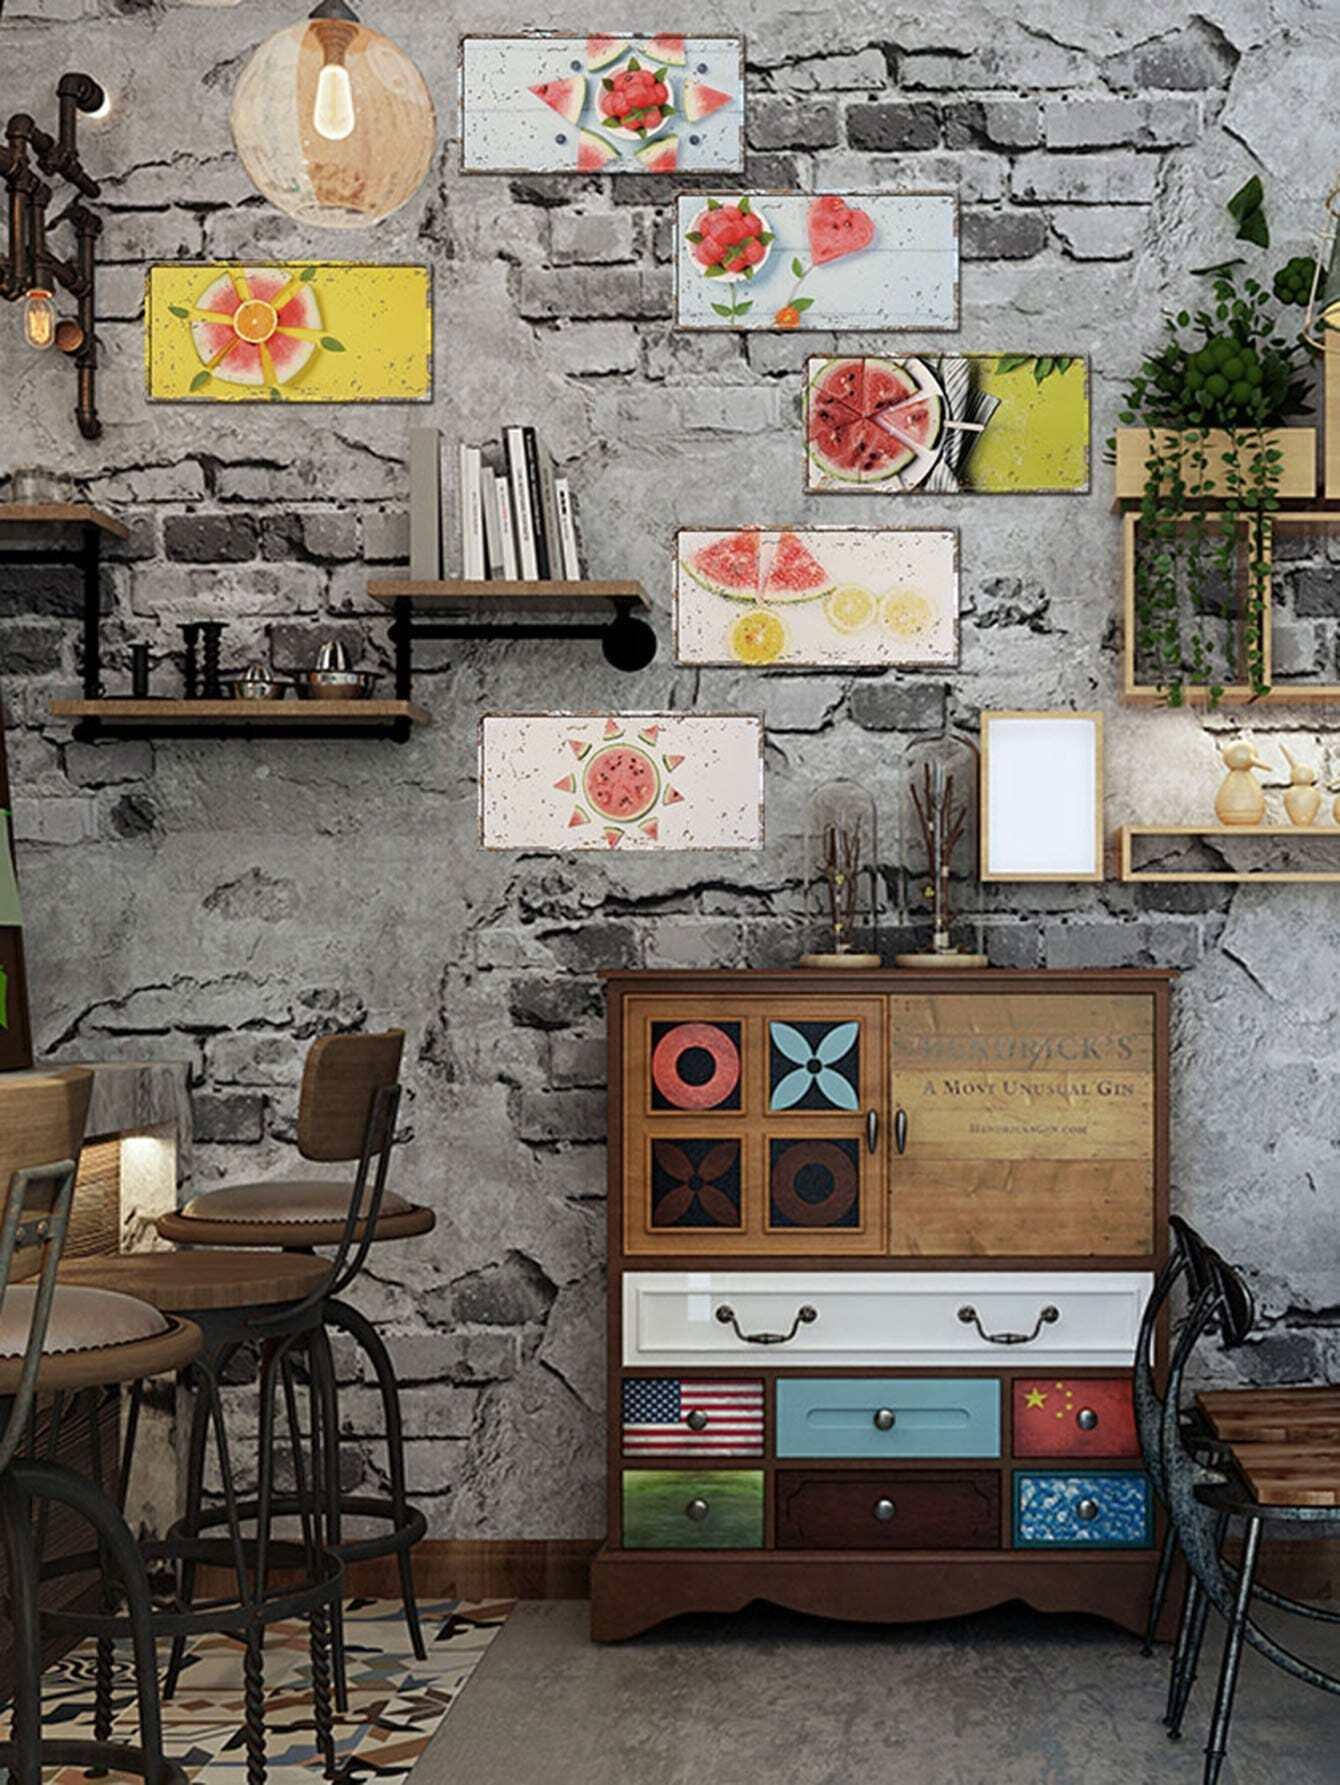 Watermelon Cut Wall Sticker 6pcs canvas stereoscopic decorative wall sticker 6pcs